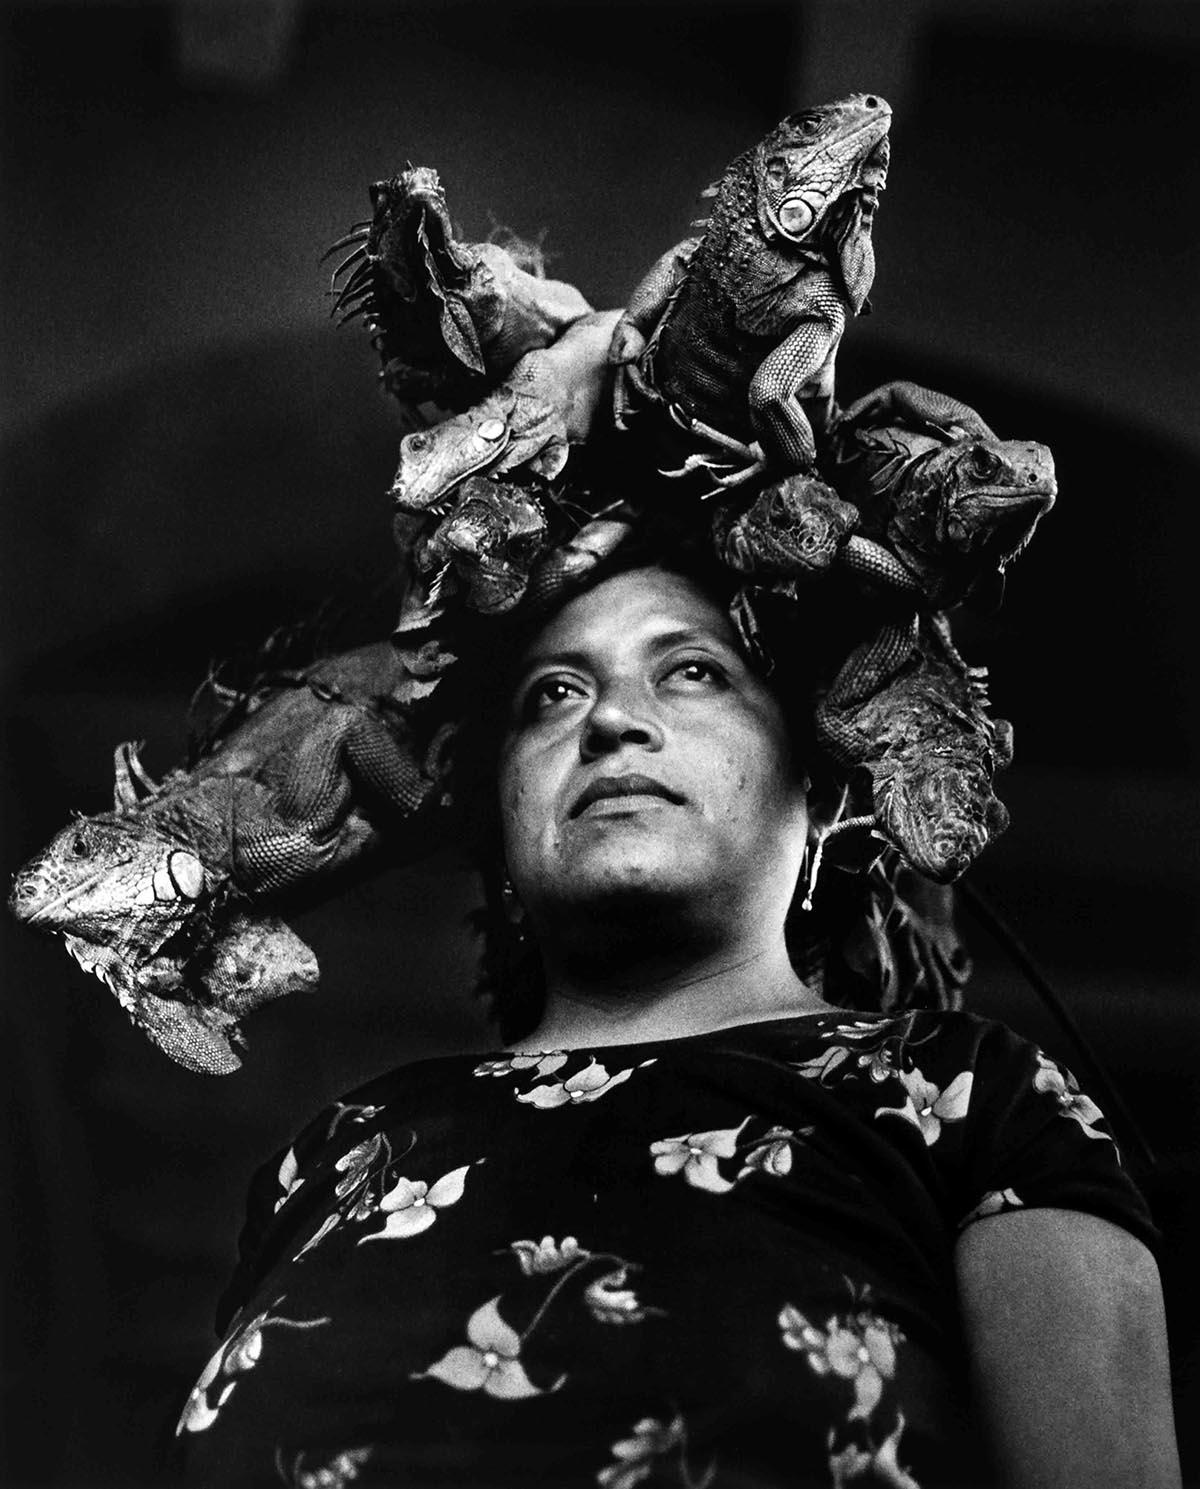 Nuestra Senora de las Iguanas, Juchitan, Mexico, 1979